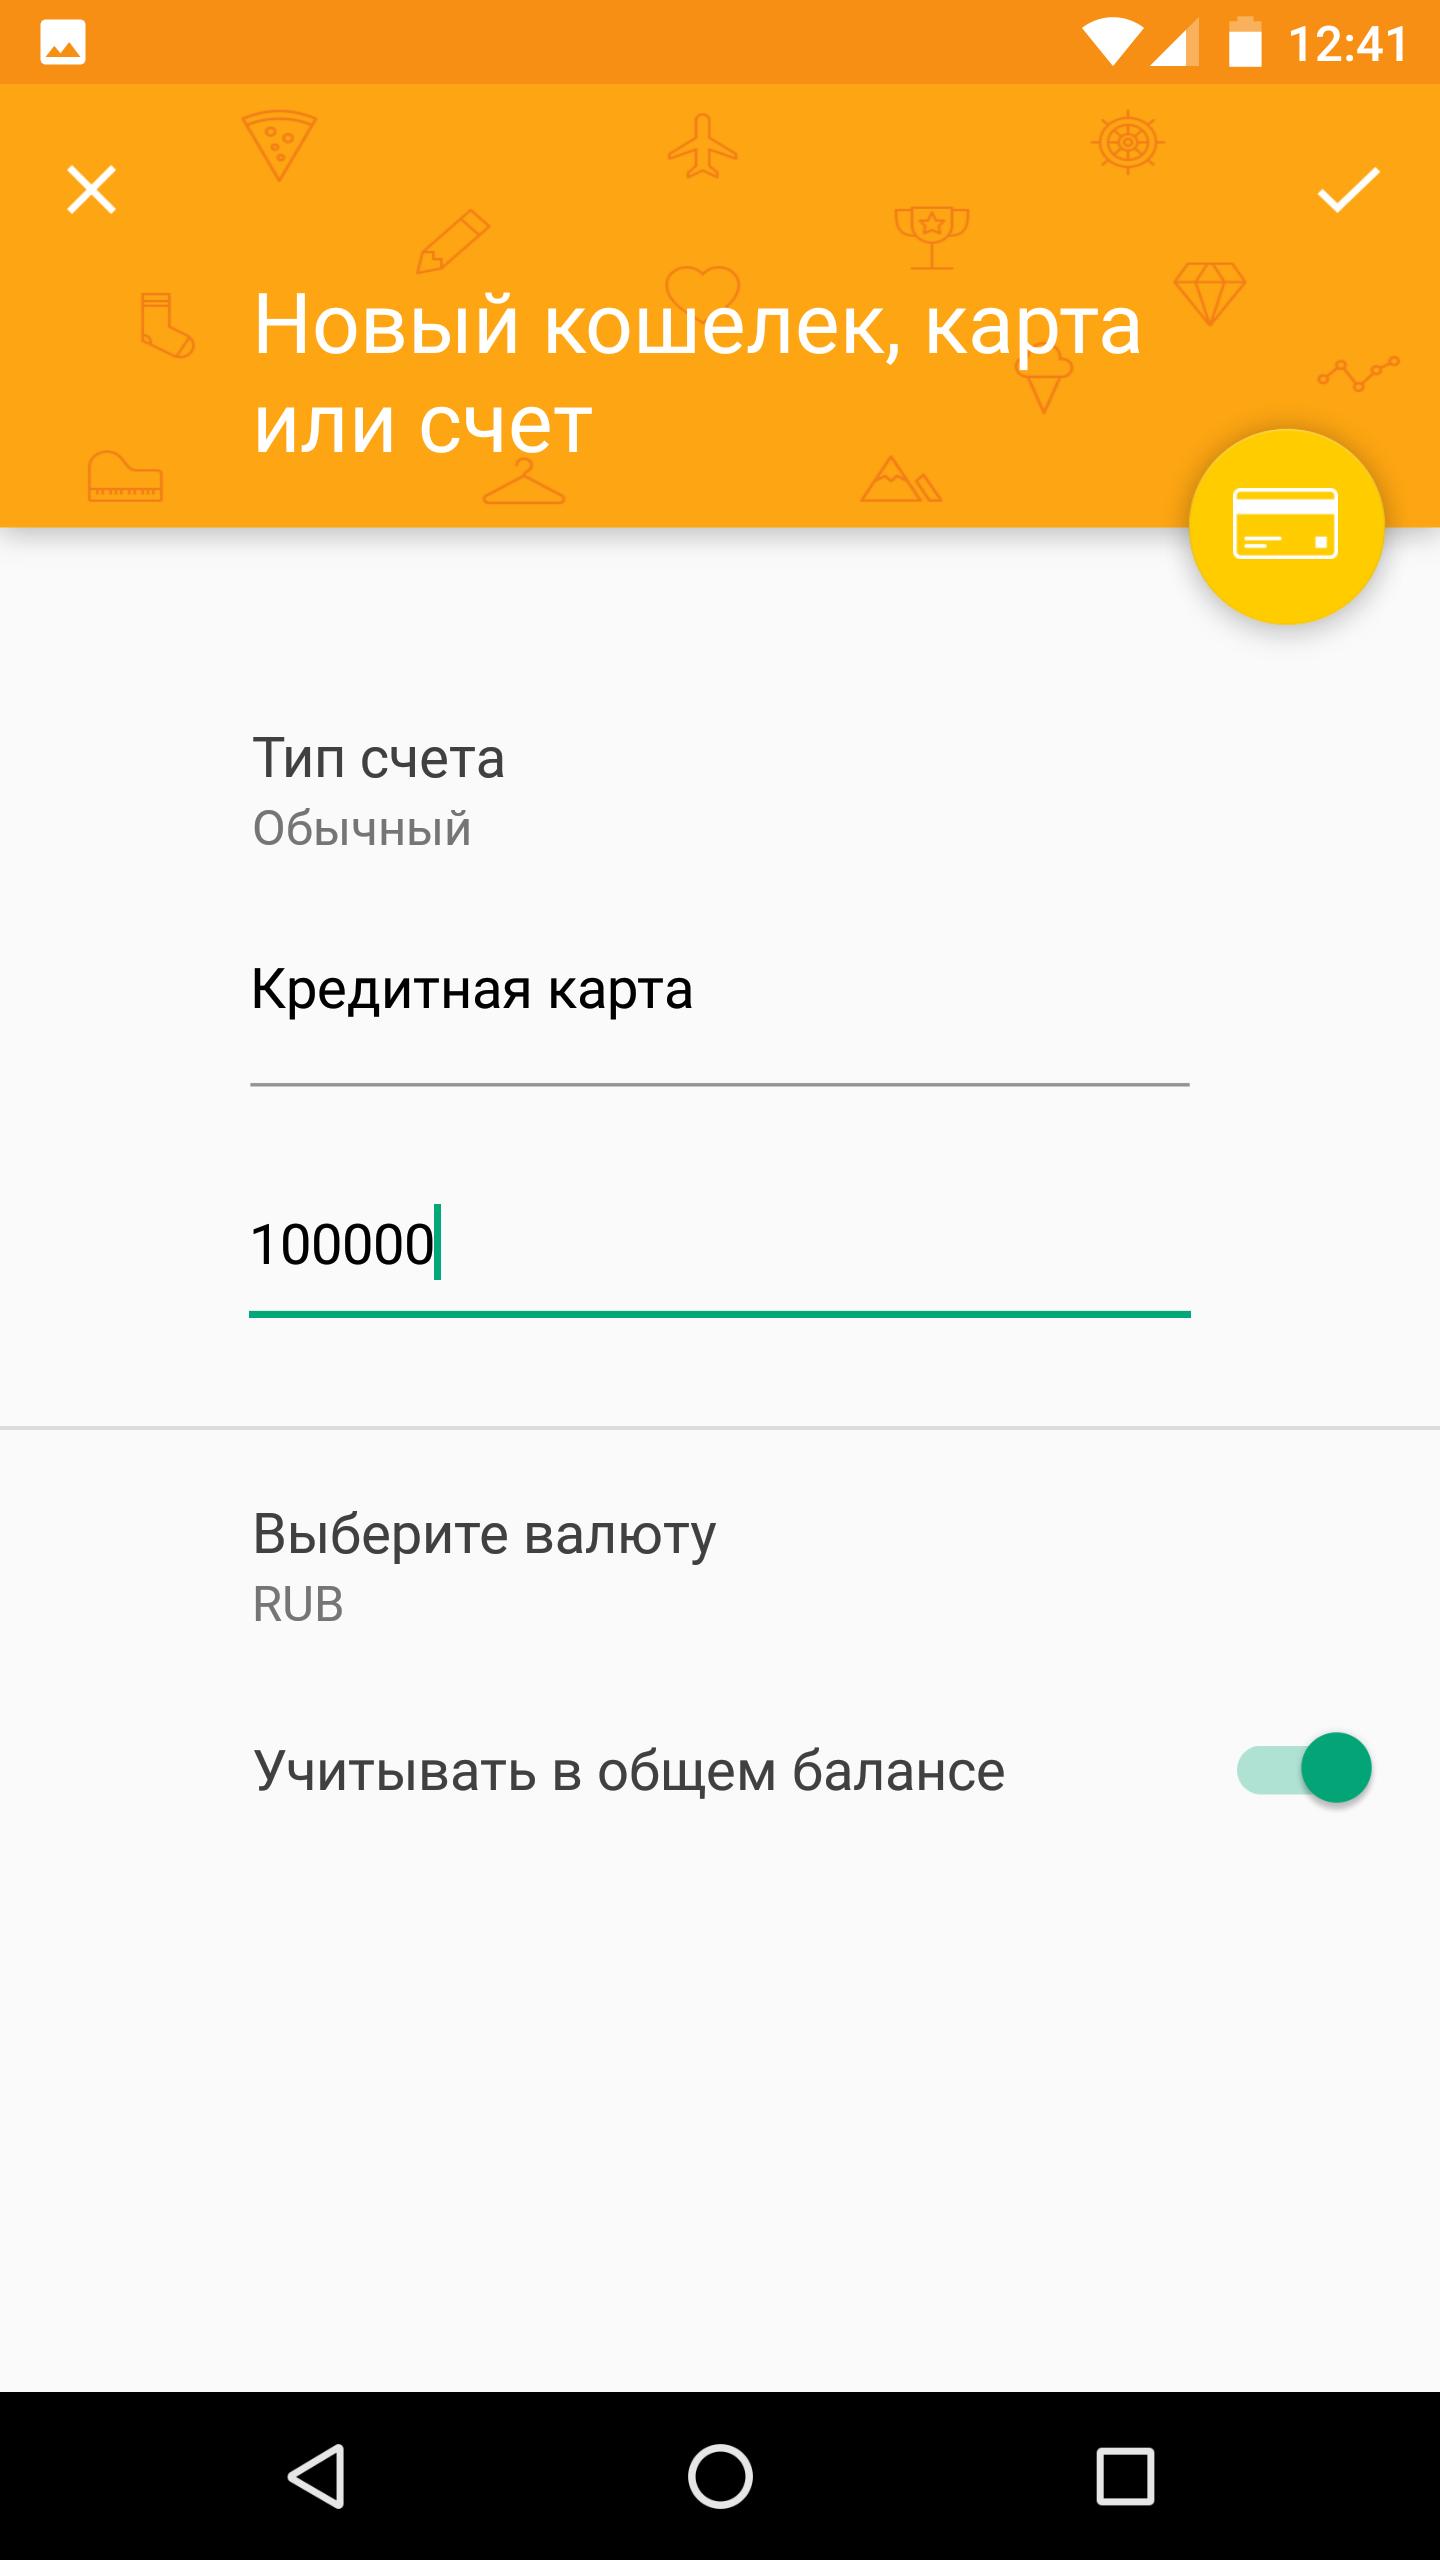 Погашение кредита беларусбанк через м банкинг